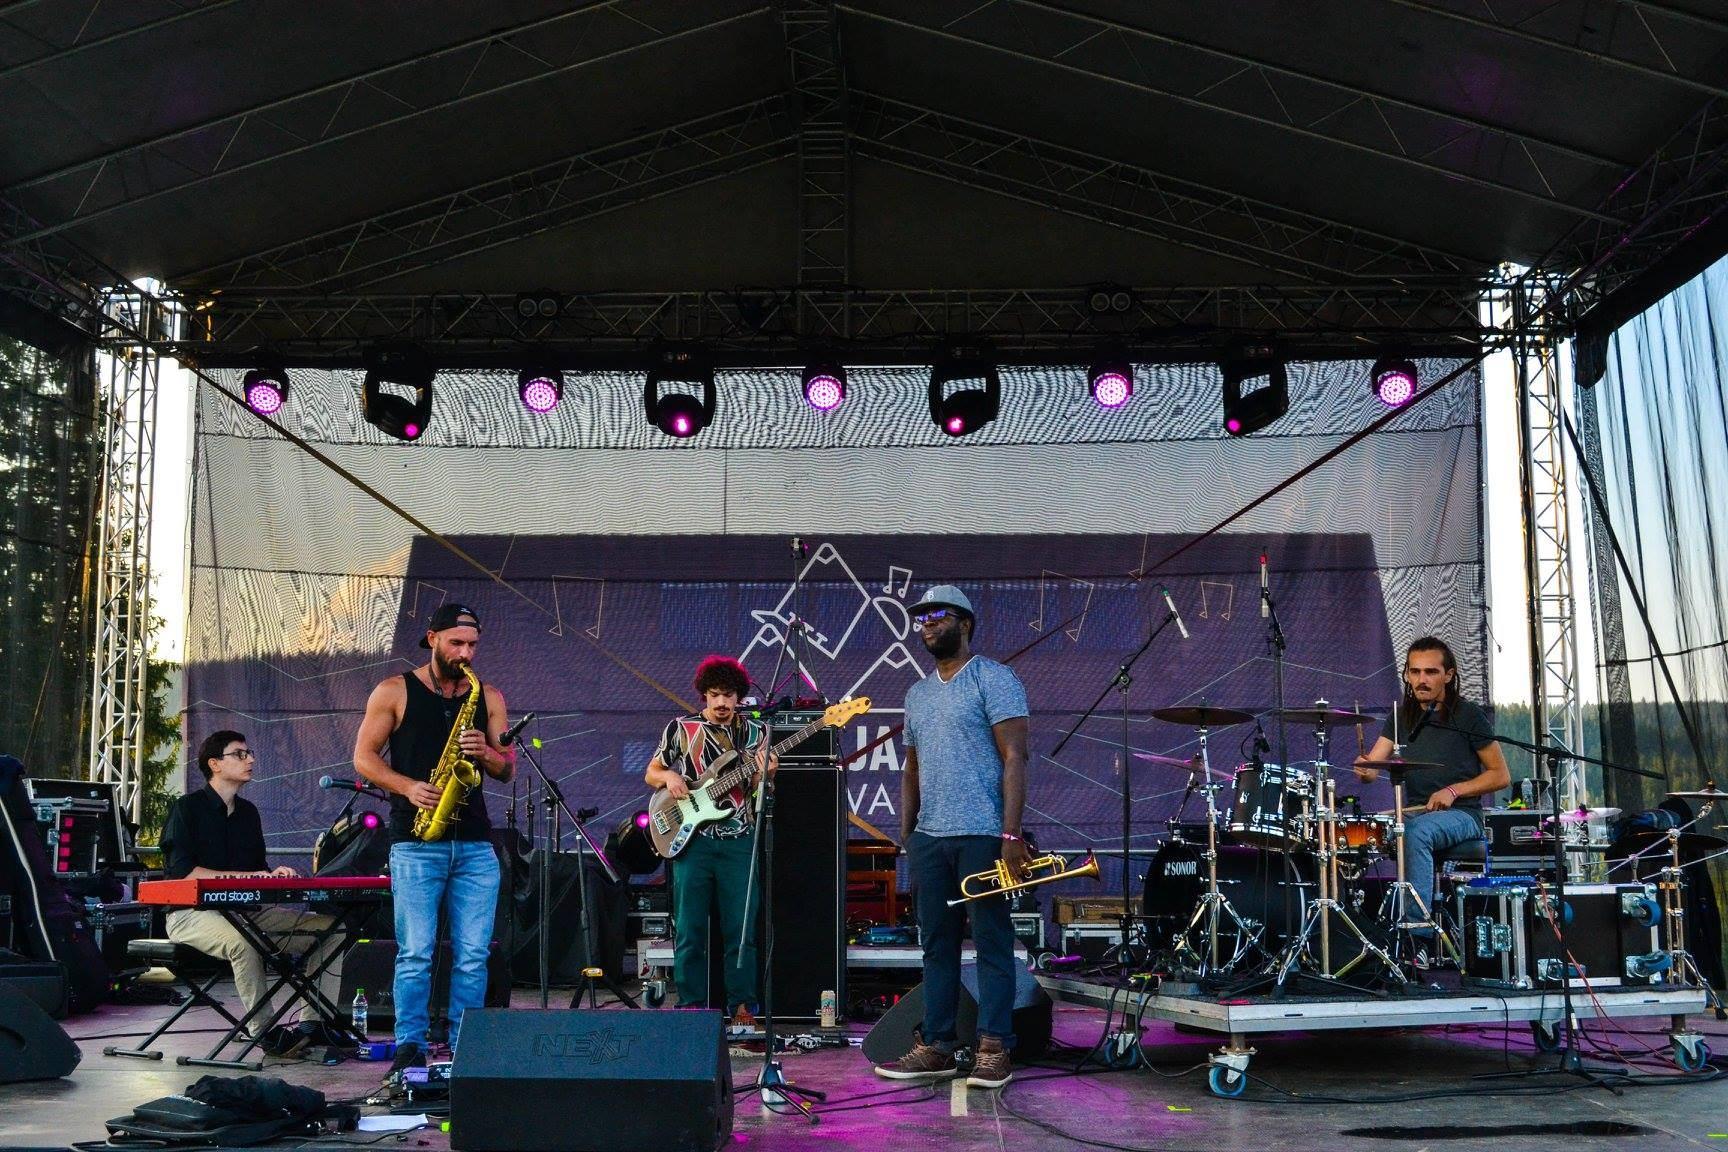 KRiSPER live. Harvis Cuni Padron (trompetă), Alexandru Arcuș (saxofon), Michael Acker (bass), Adi Stoenescu (Pian), Radu Pieloiu (tobe)